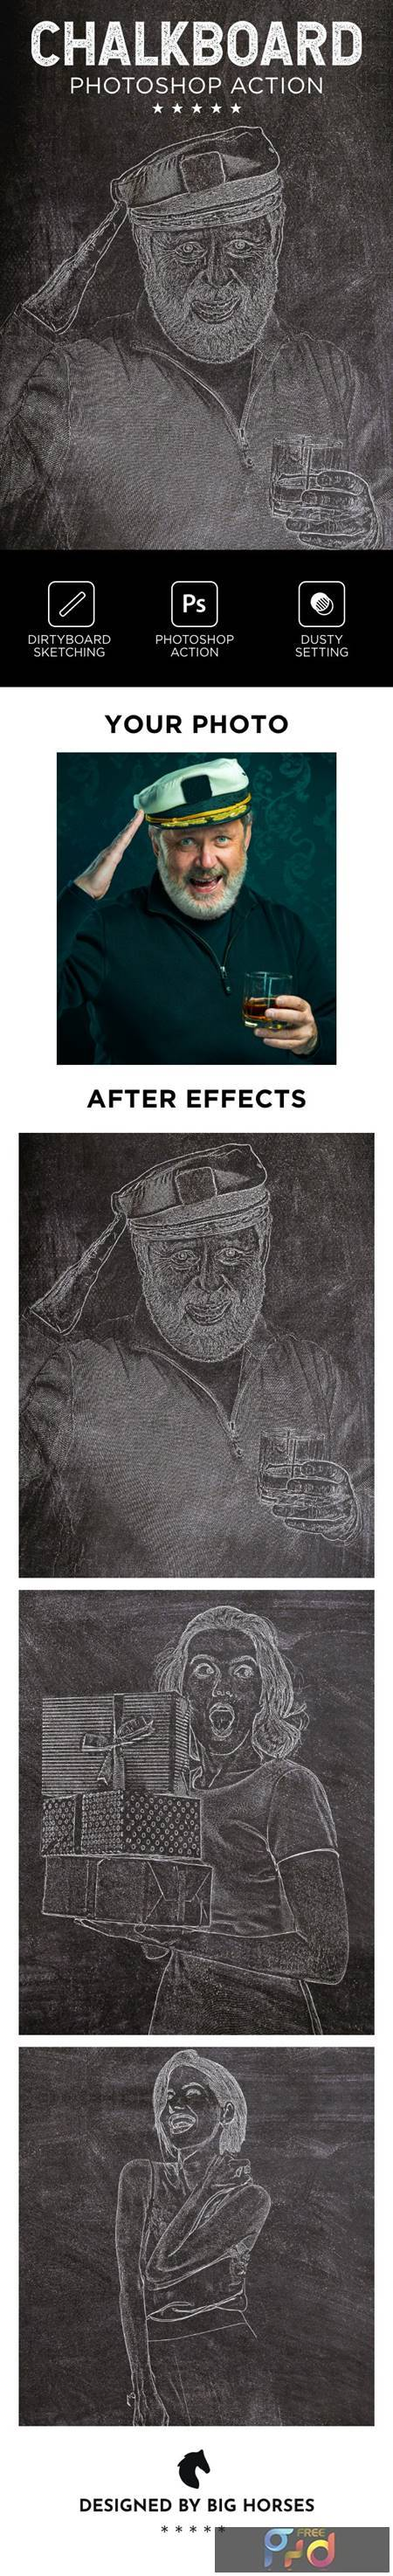 Chalkboard Photoshop Action 26560014 1